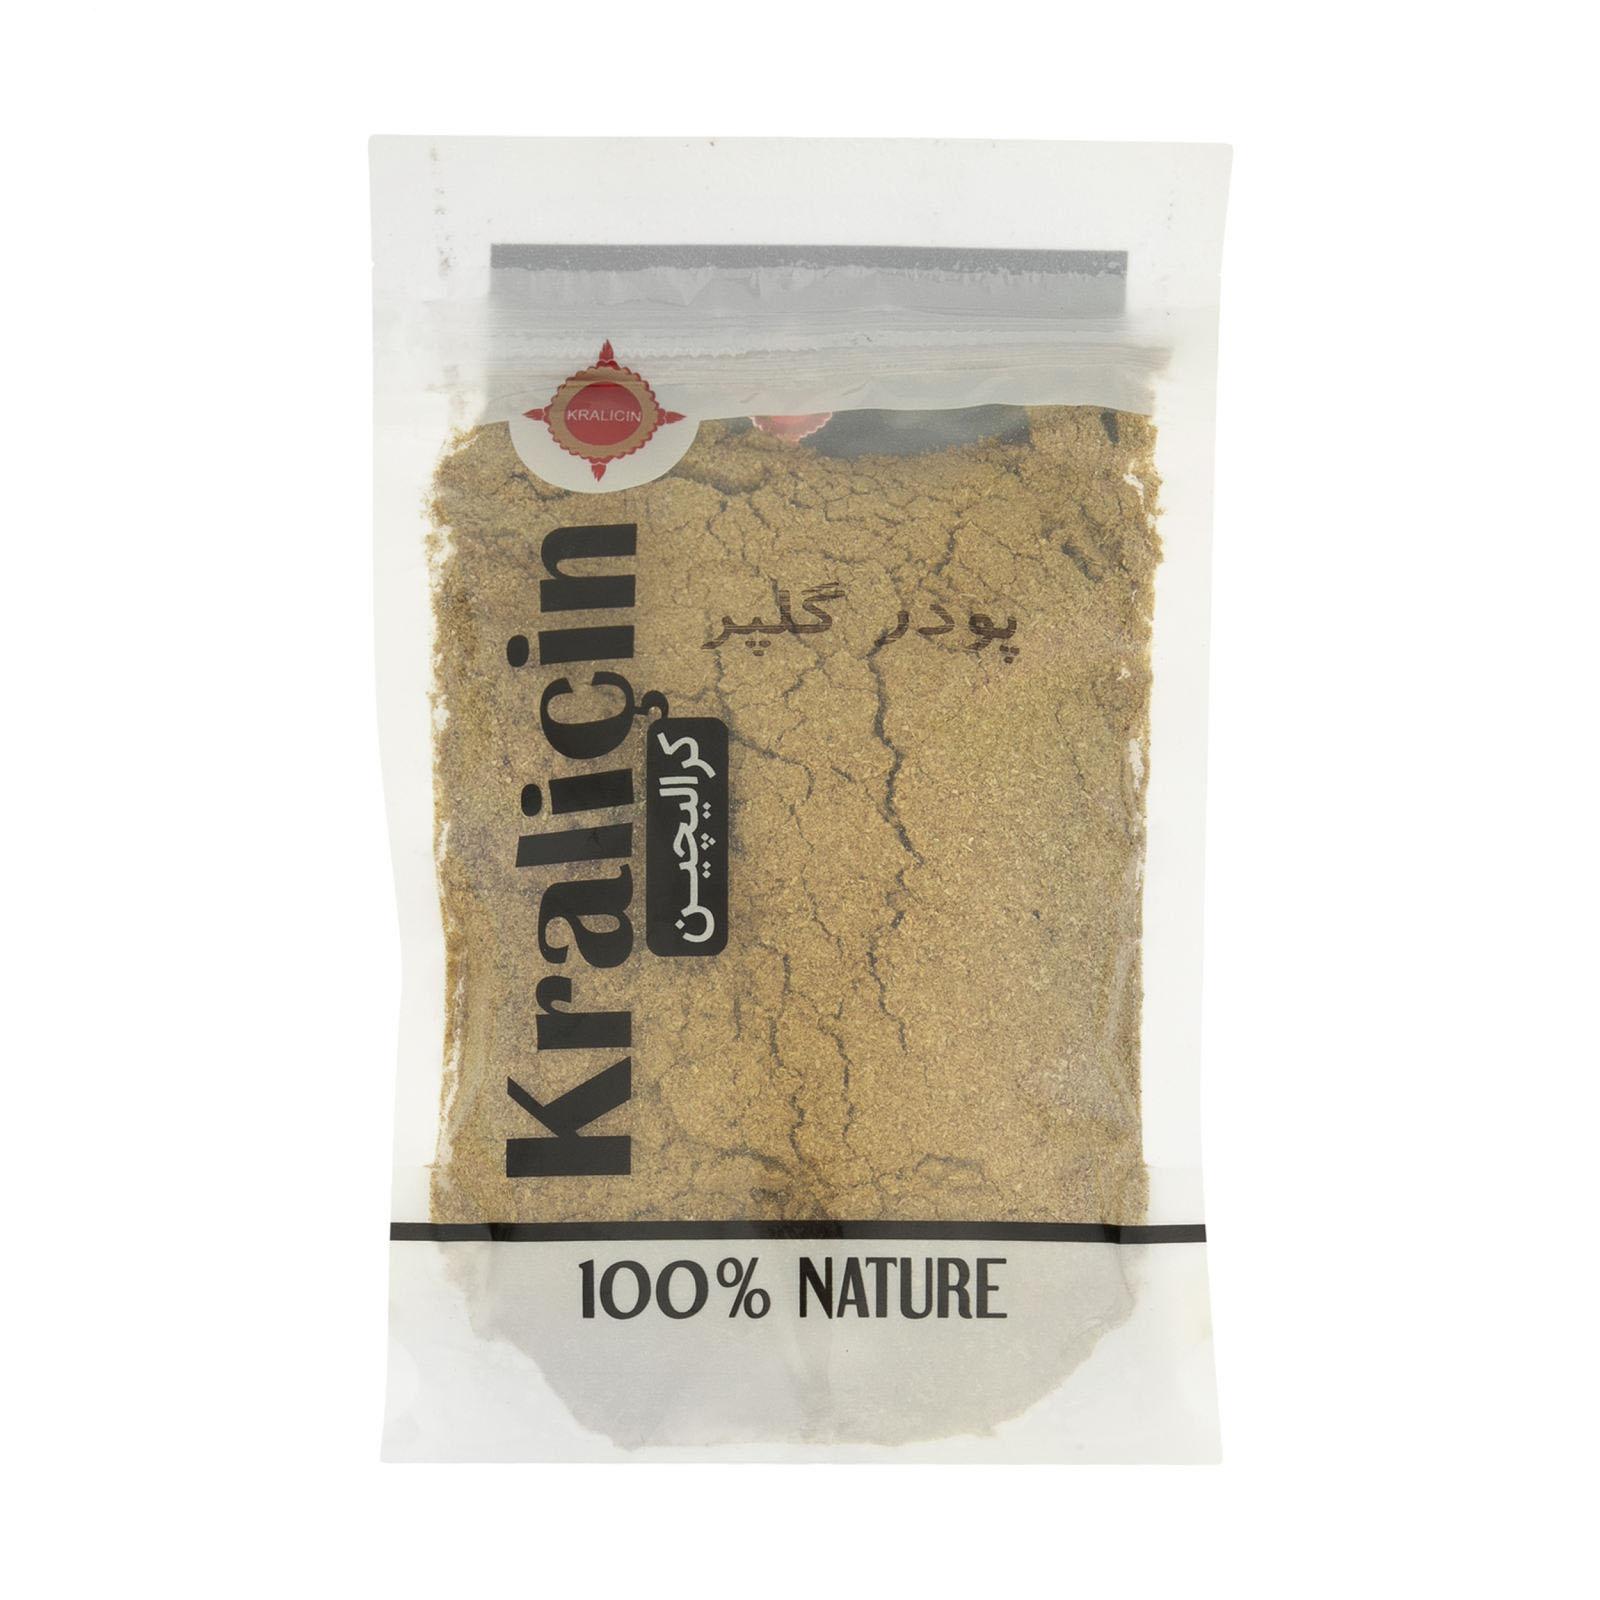 پودر گلپر کرالیچین – ۱۰۰ گرم